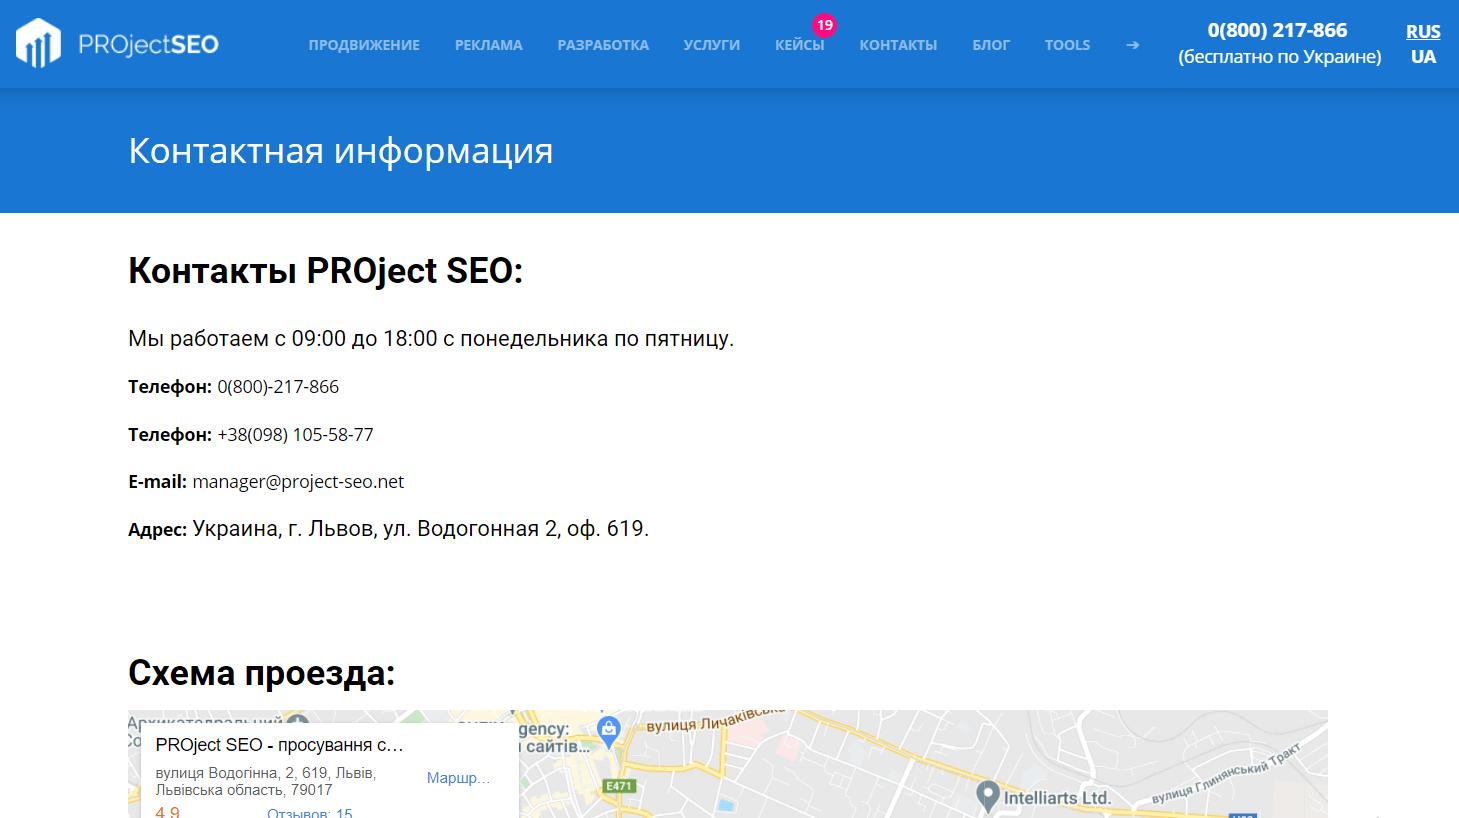 PROject SEO - обзор компании, услуги, отзывы, клиенты   Google SEO, Фото № 2 - google-seo.pro